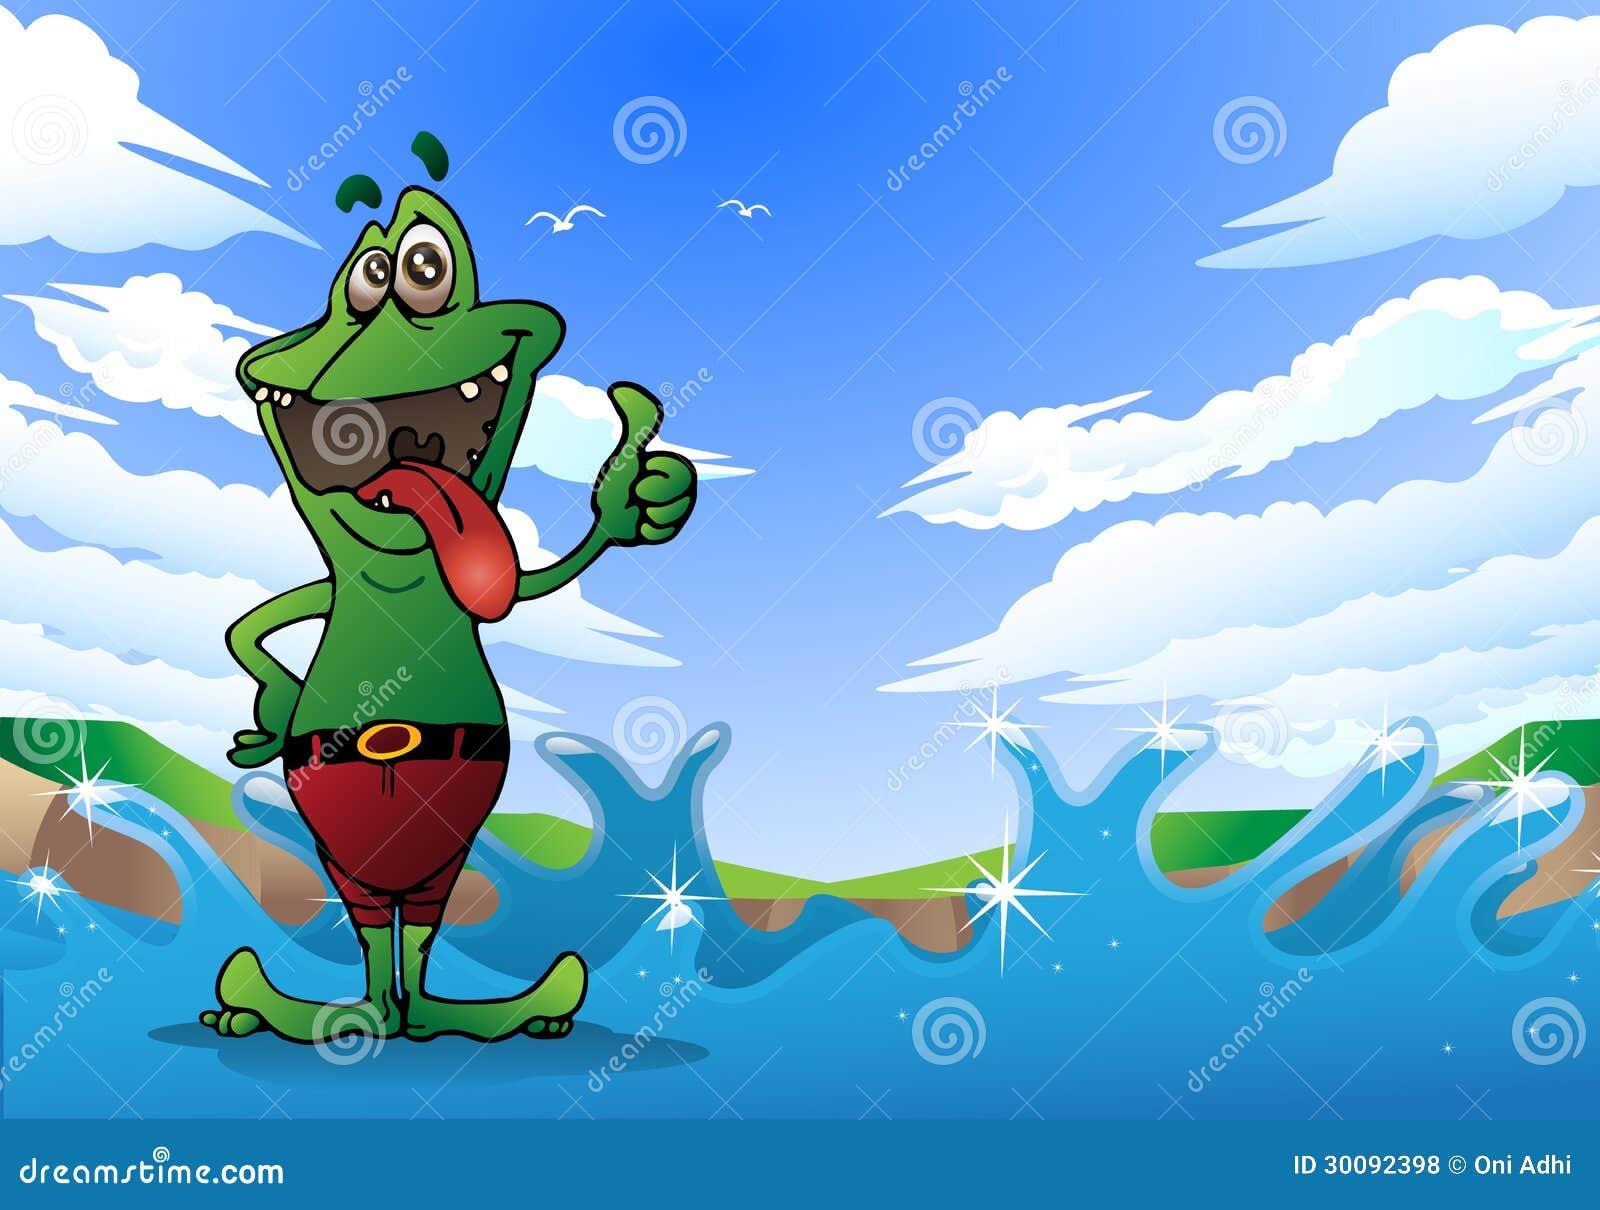 Crazy Frog Thumb Up Royalty Free Stock Photos Image